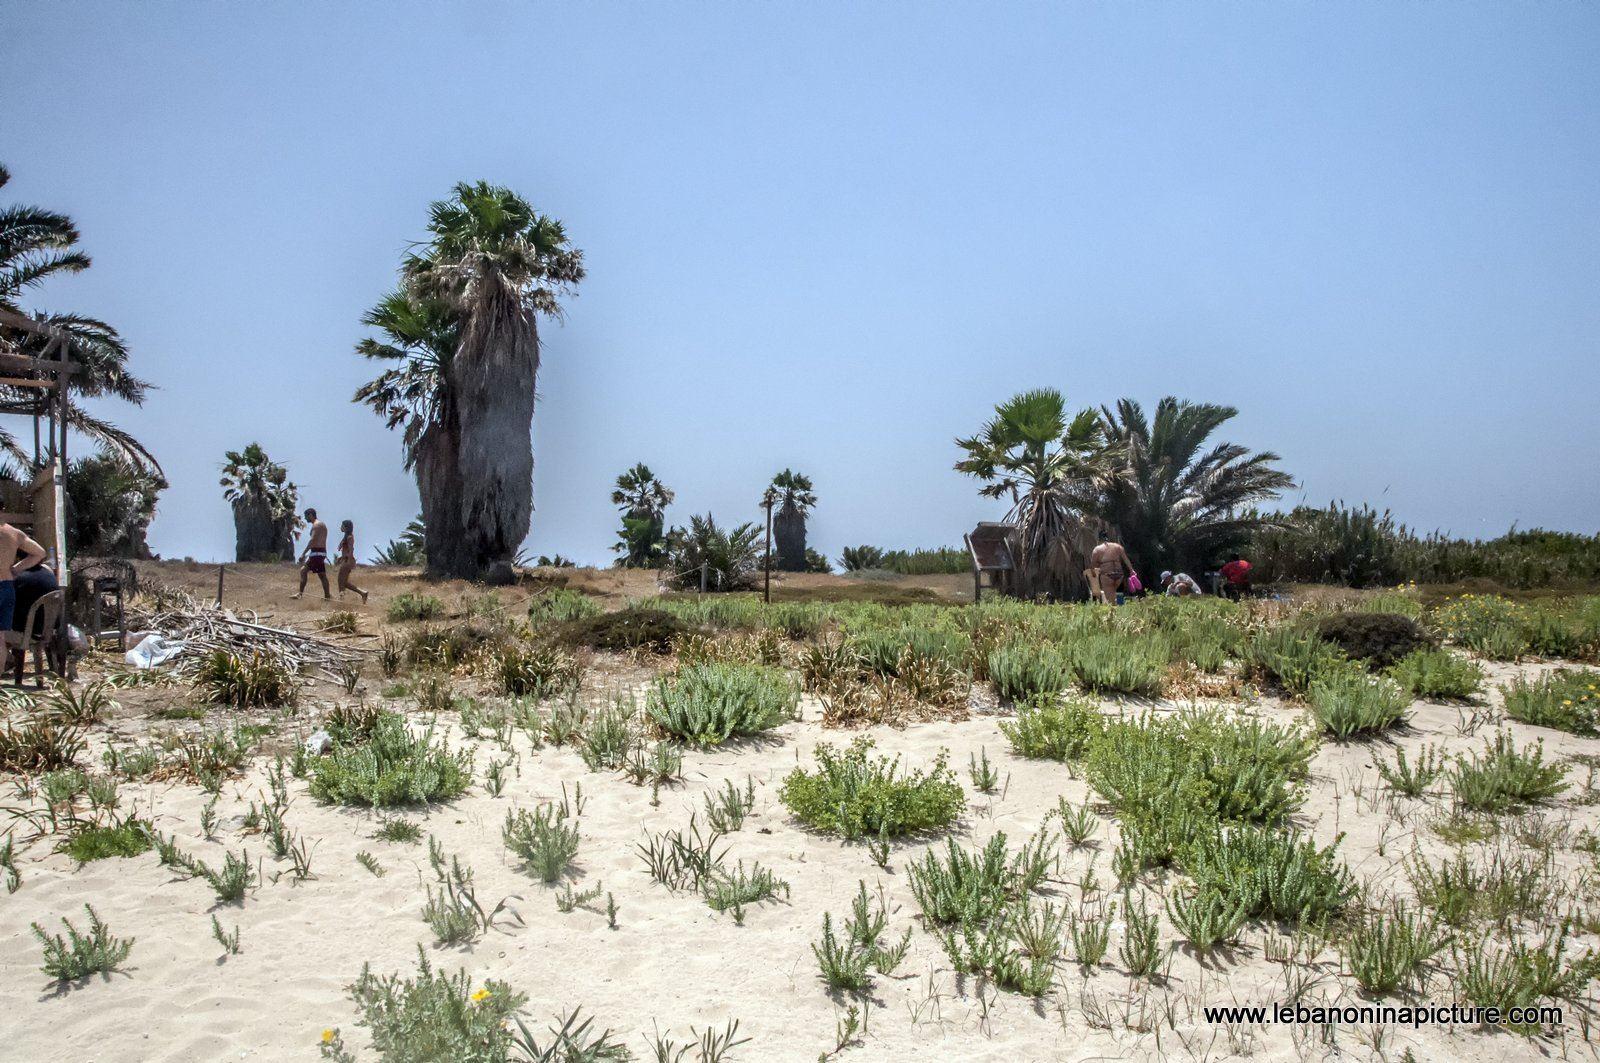 The Rabbit Island , North Lebanon جزيرة الارانب ، شمال لبنان (Palm Island)